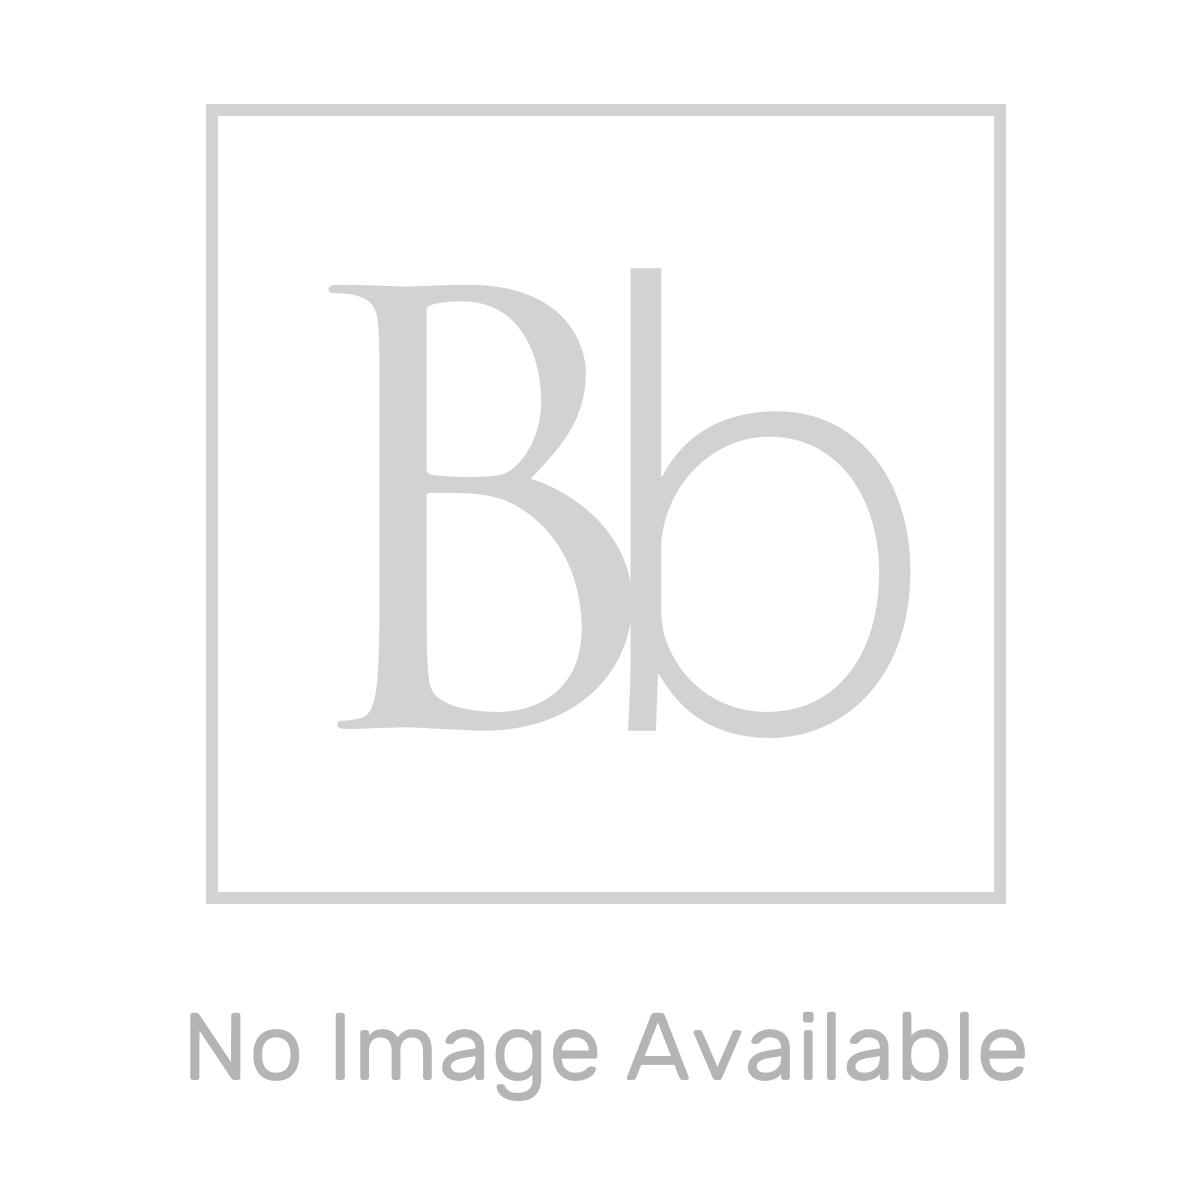 Burlington Round Light with Chrome Base and Chiffon Silver Shade